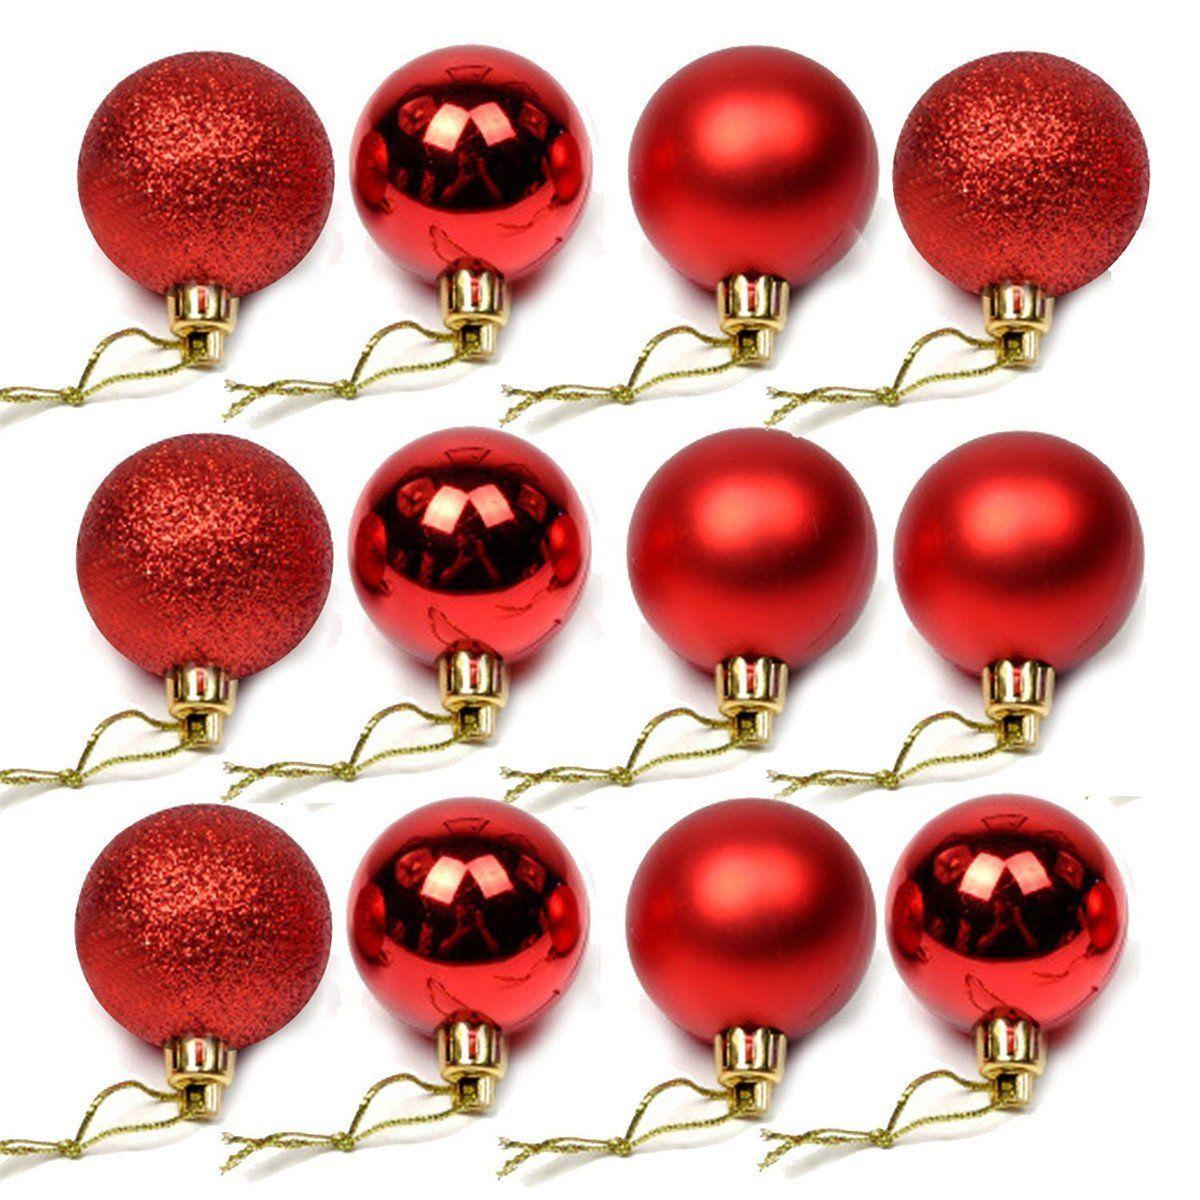 Yyaaloa 24pcs Exquisite Balls Ornaments 1 57 For Christmas Tree Decor Decoration Ball Decorative Ornament Set Christmas Tree Decorations Christmas Decorations